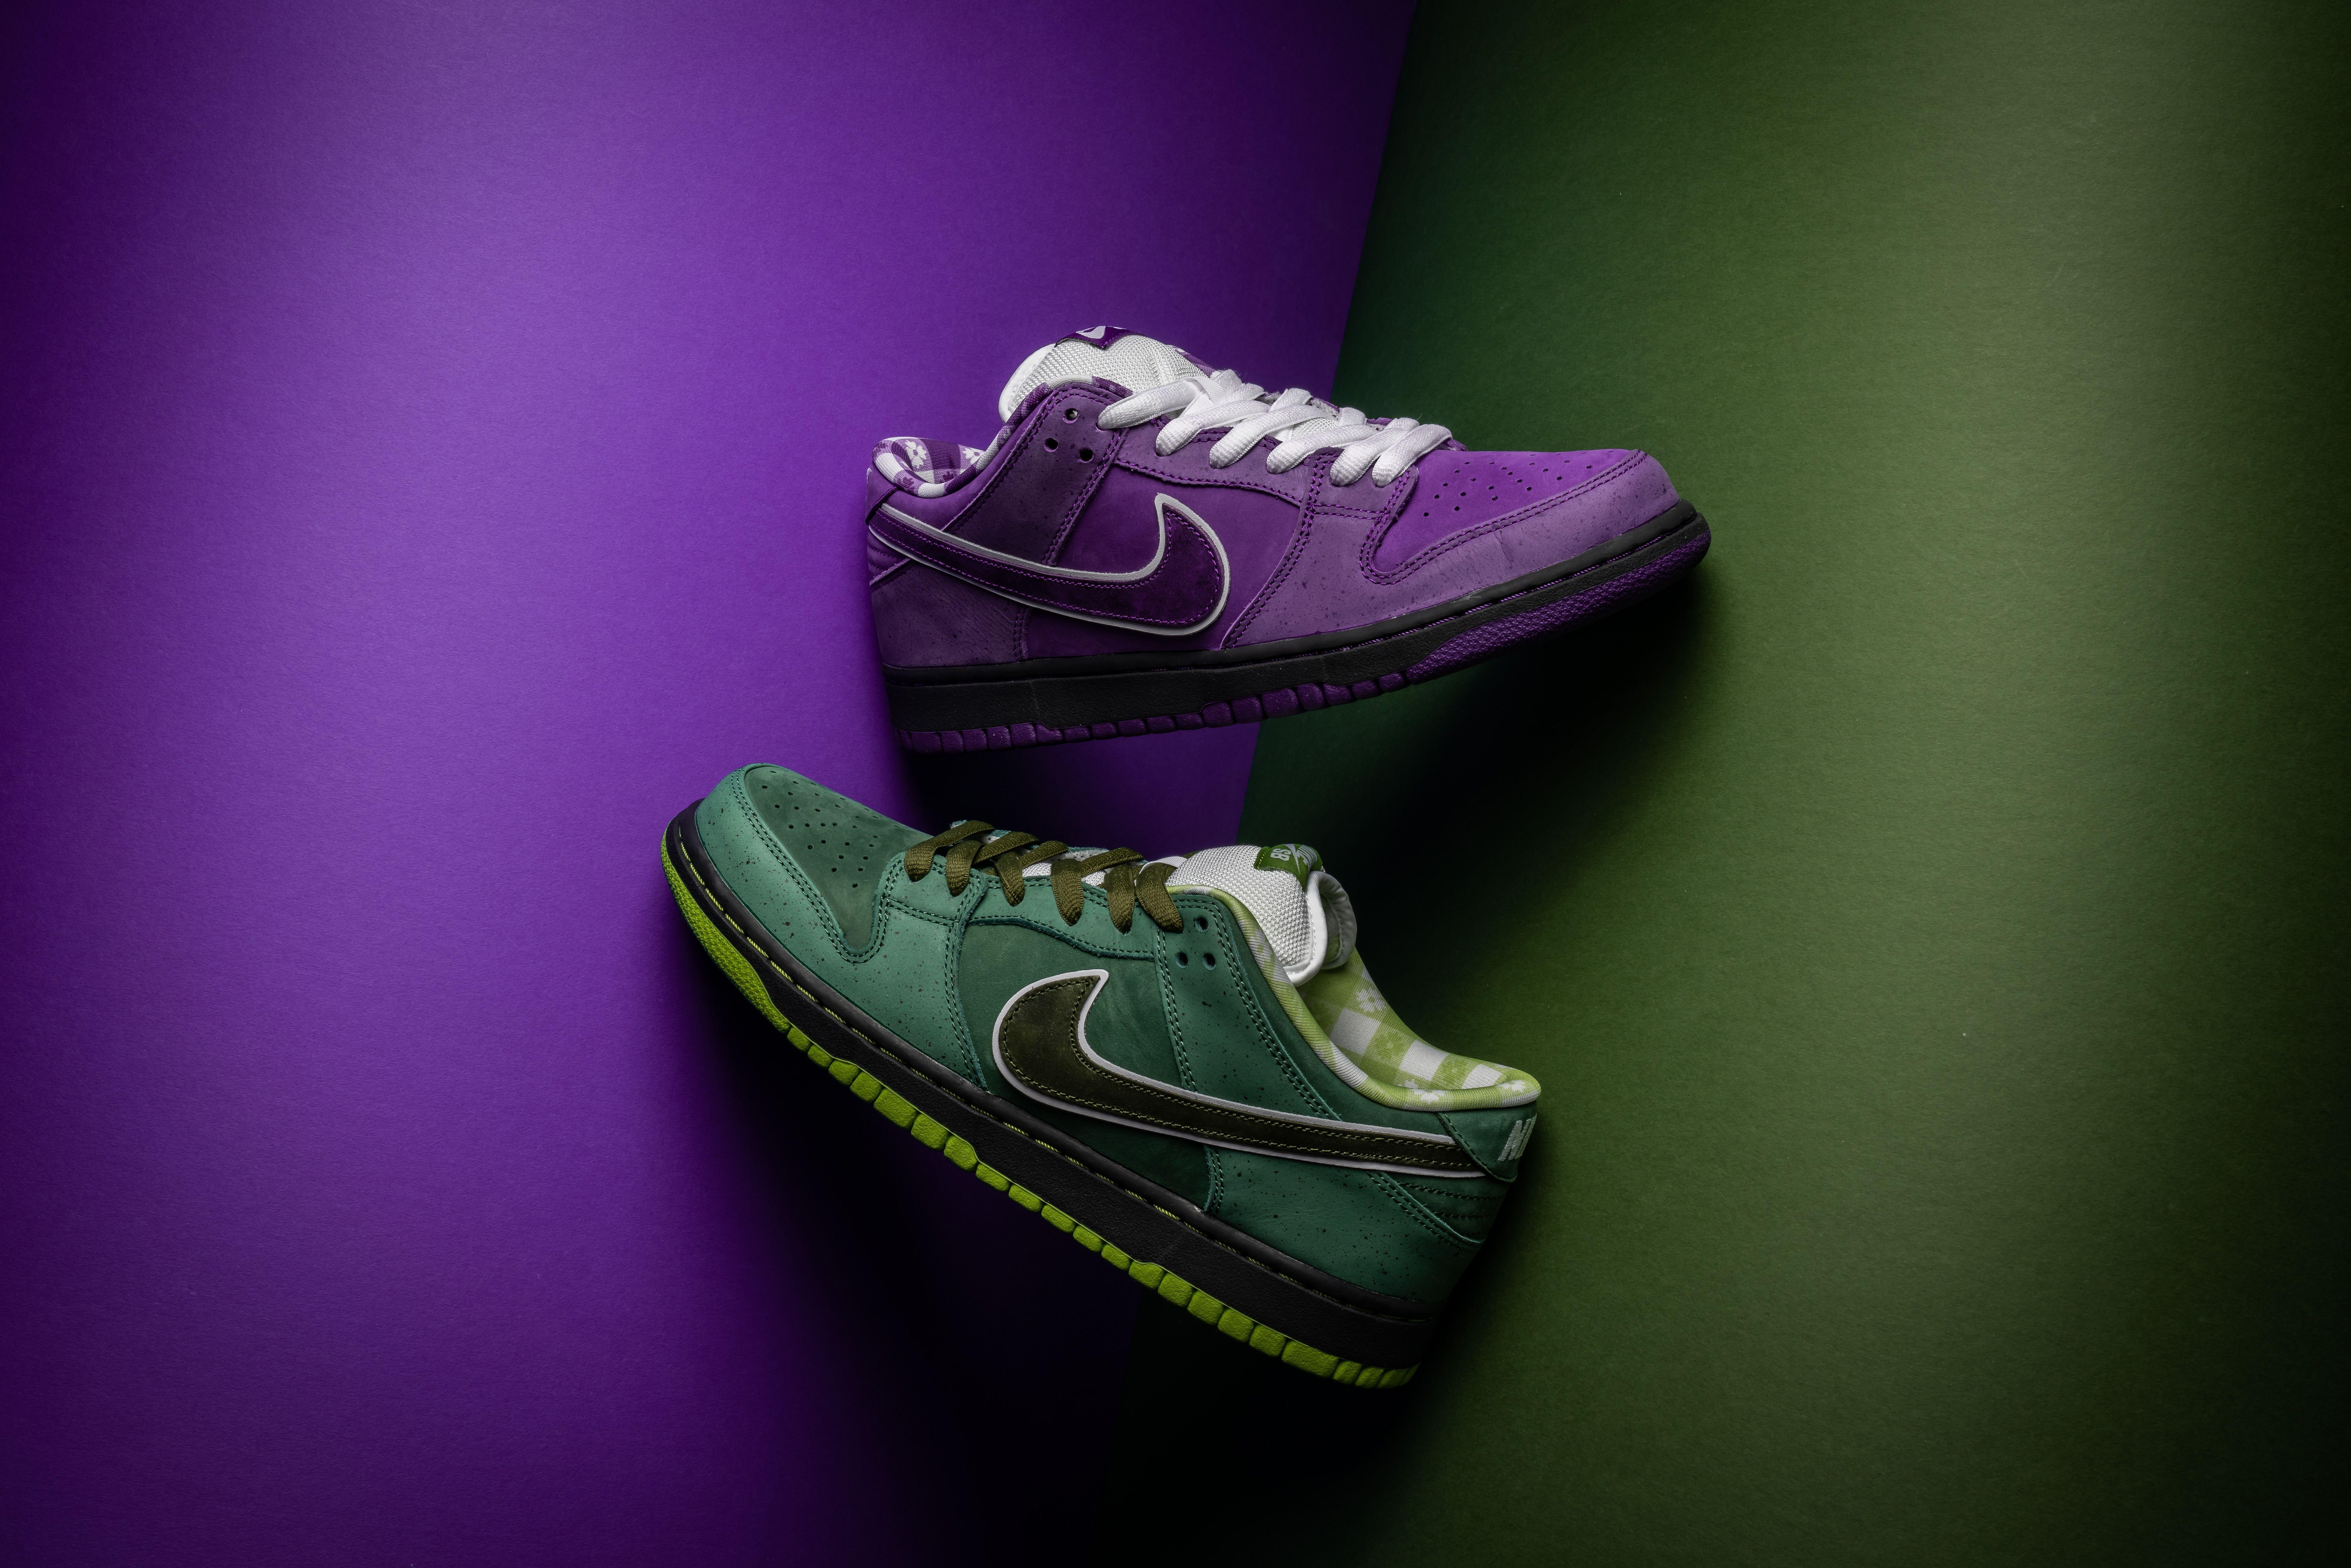 nike dunks green black white purple